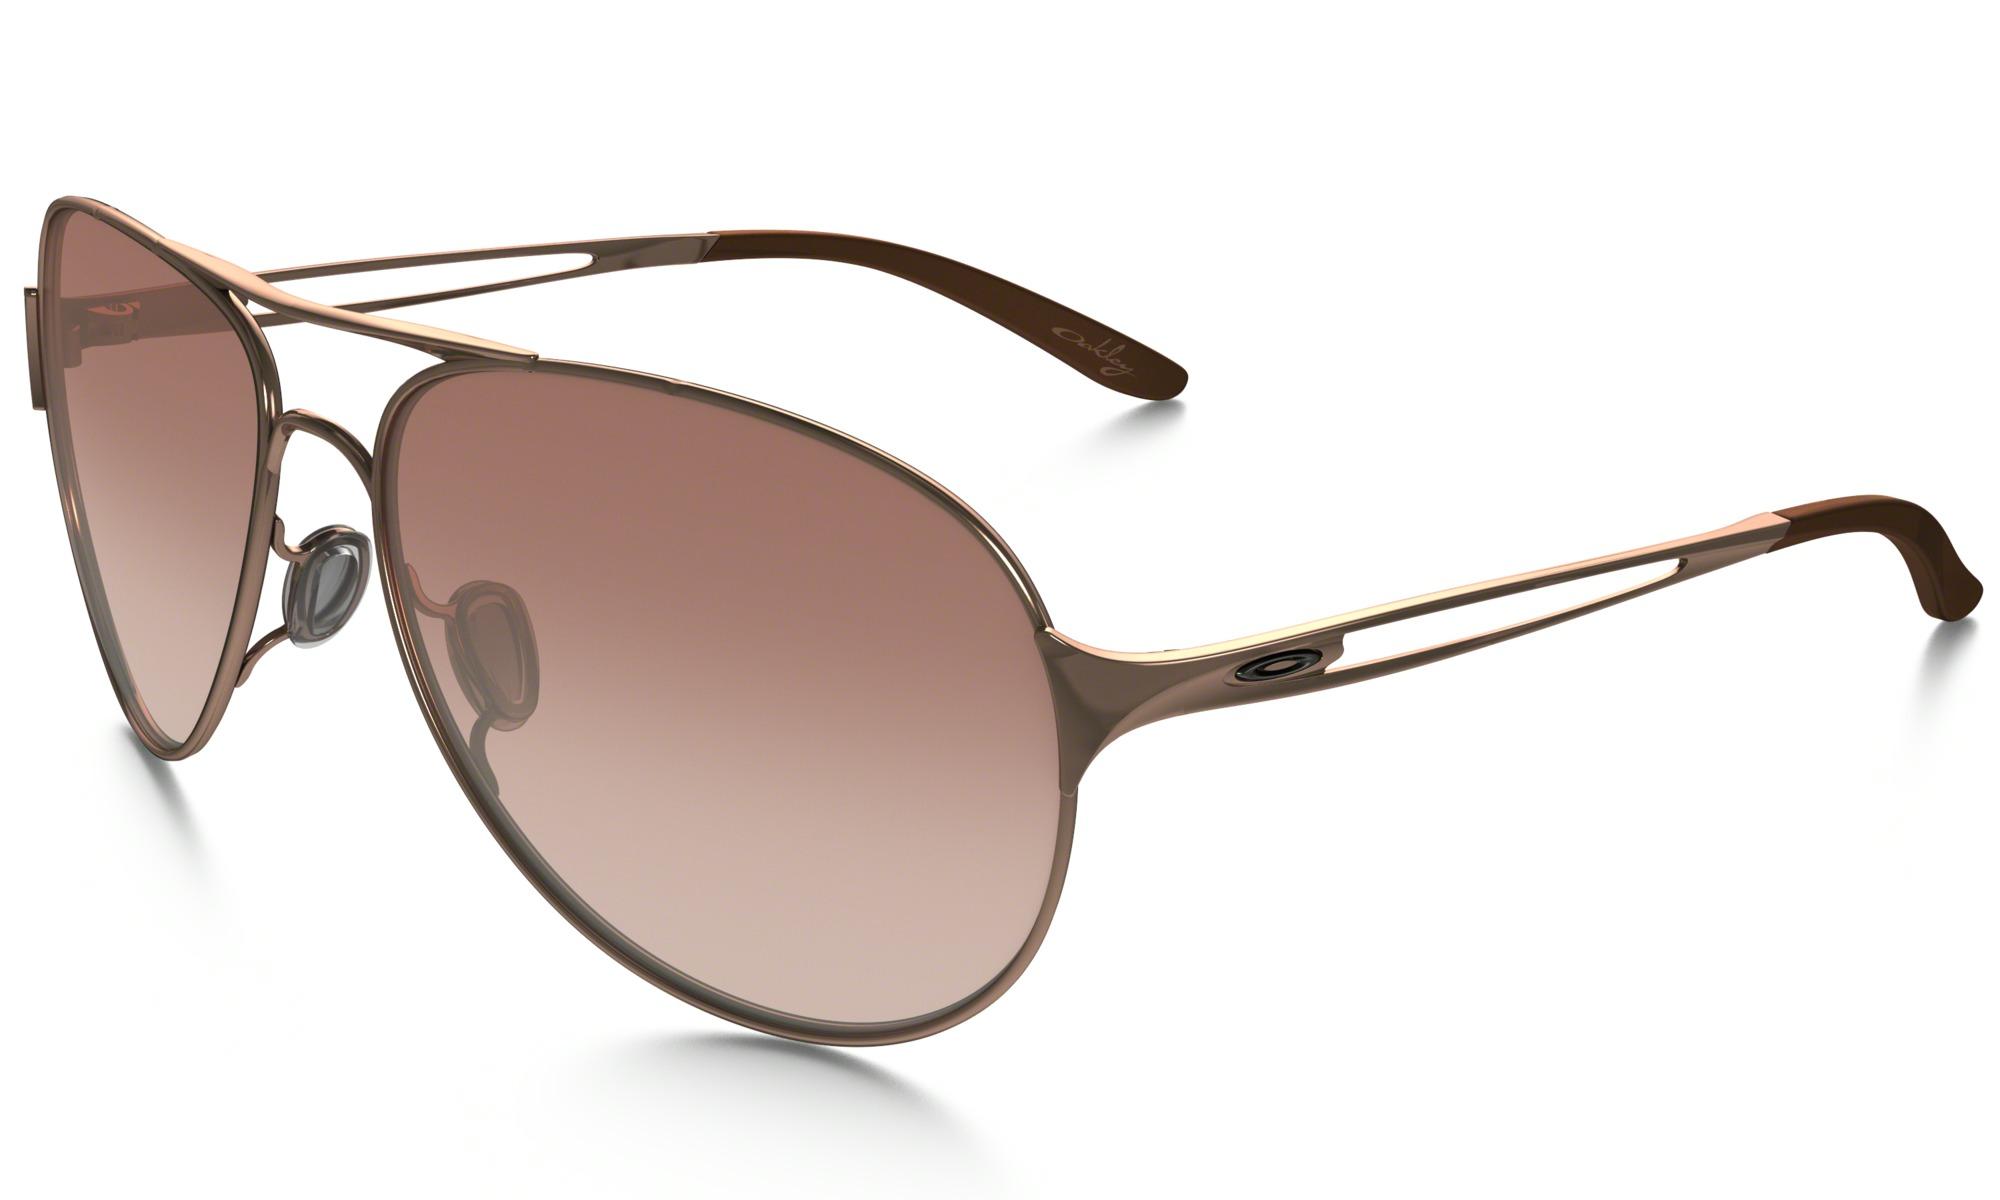 74fcbf3a79c Oakley Caveat Sunglasses Rose Gold « Heritage Malta